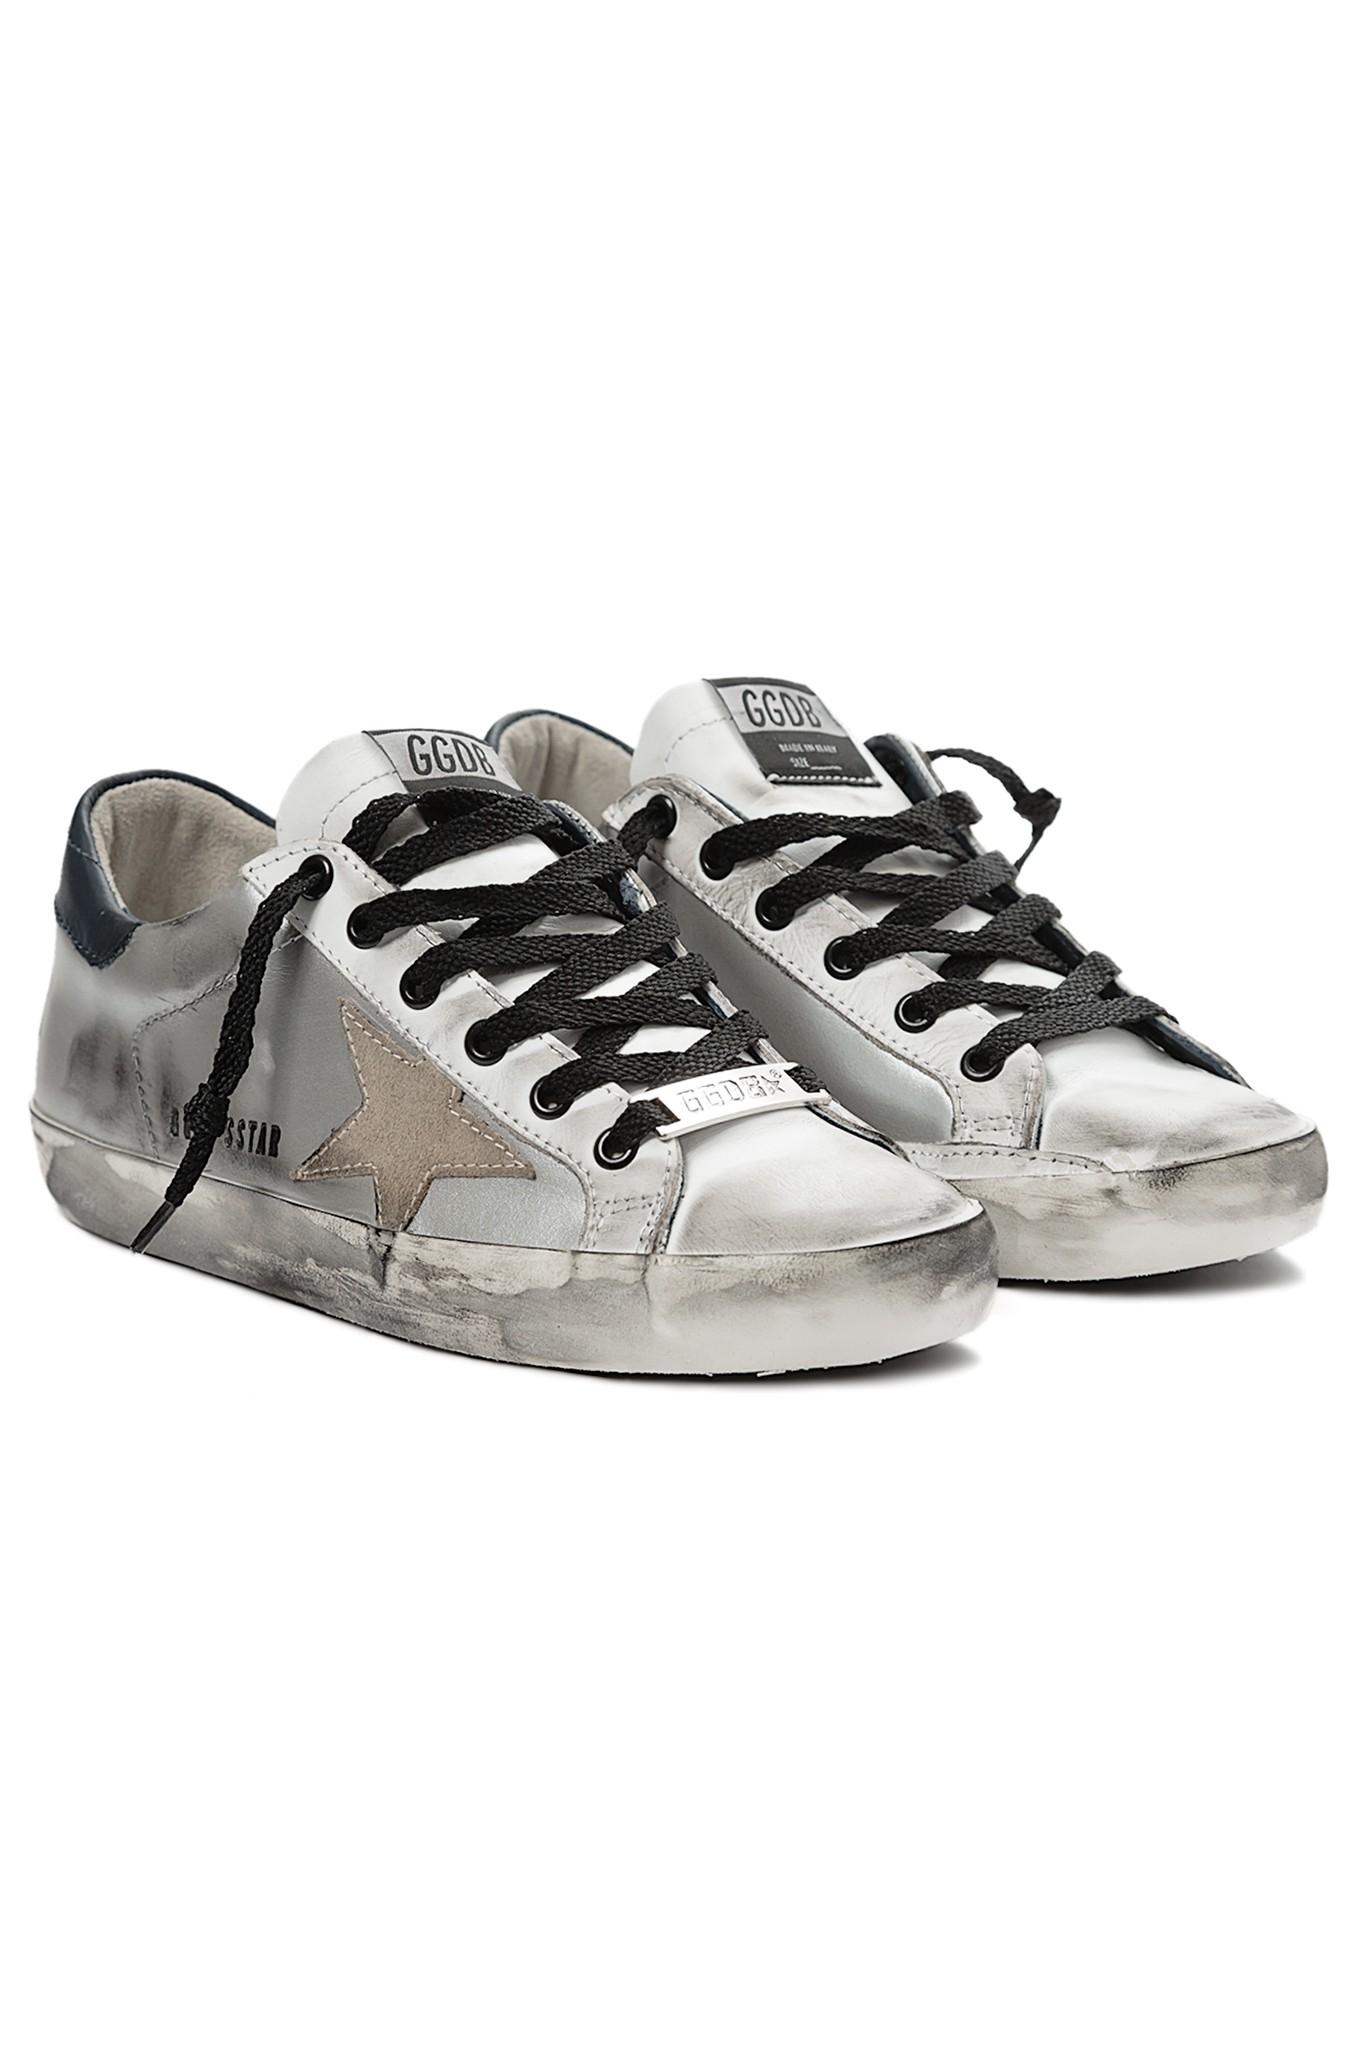 65d1349b82bc Golden goose deluxe brand Superstar Low Sneaker in Silver .